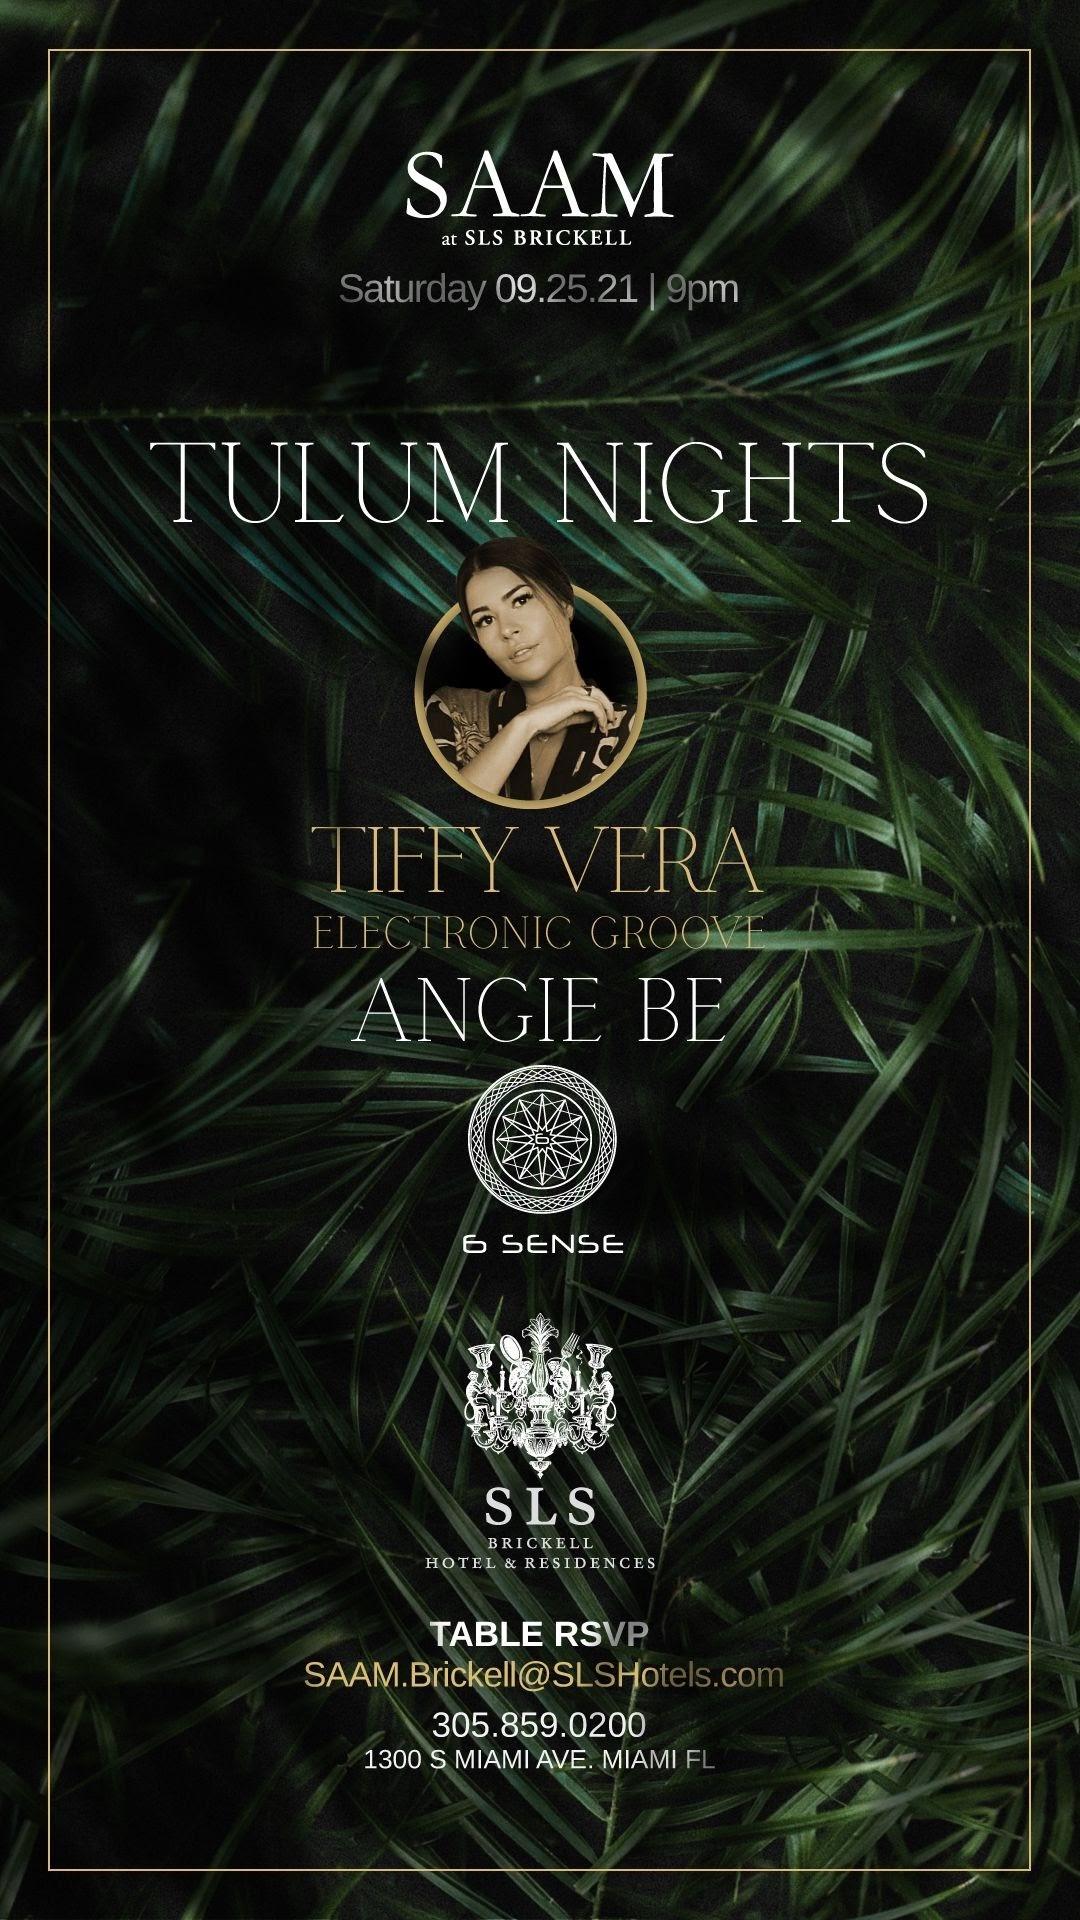 +++ SAAM Lounge Tulum Nights - DJ Performance by Tiffy Vera & Angie Be